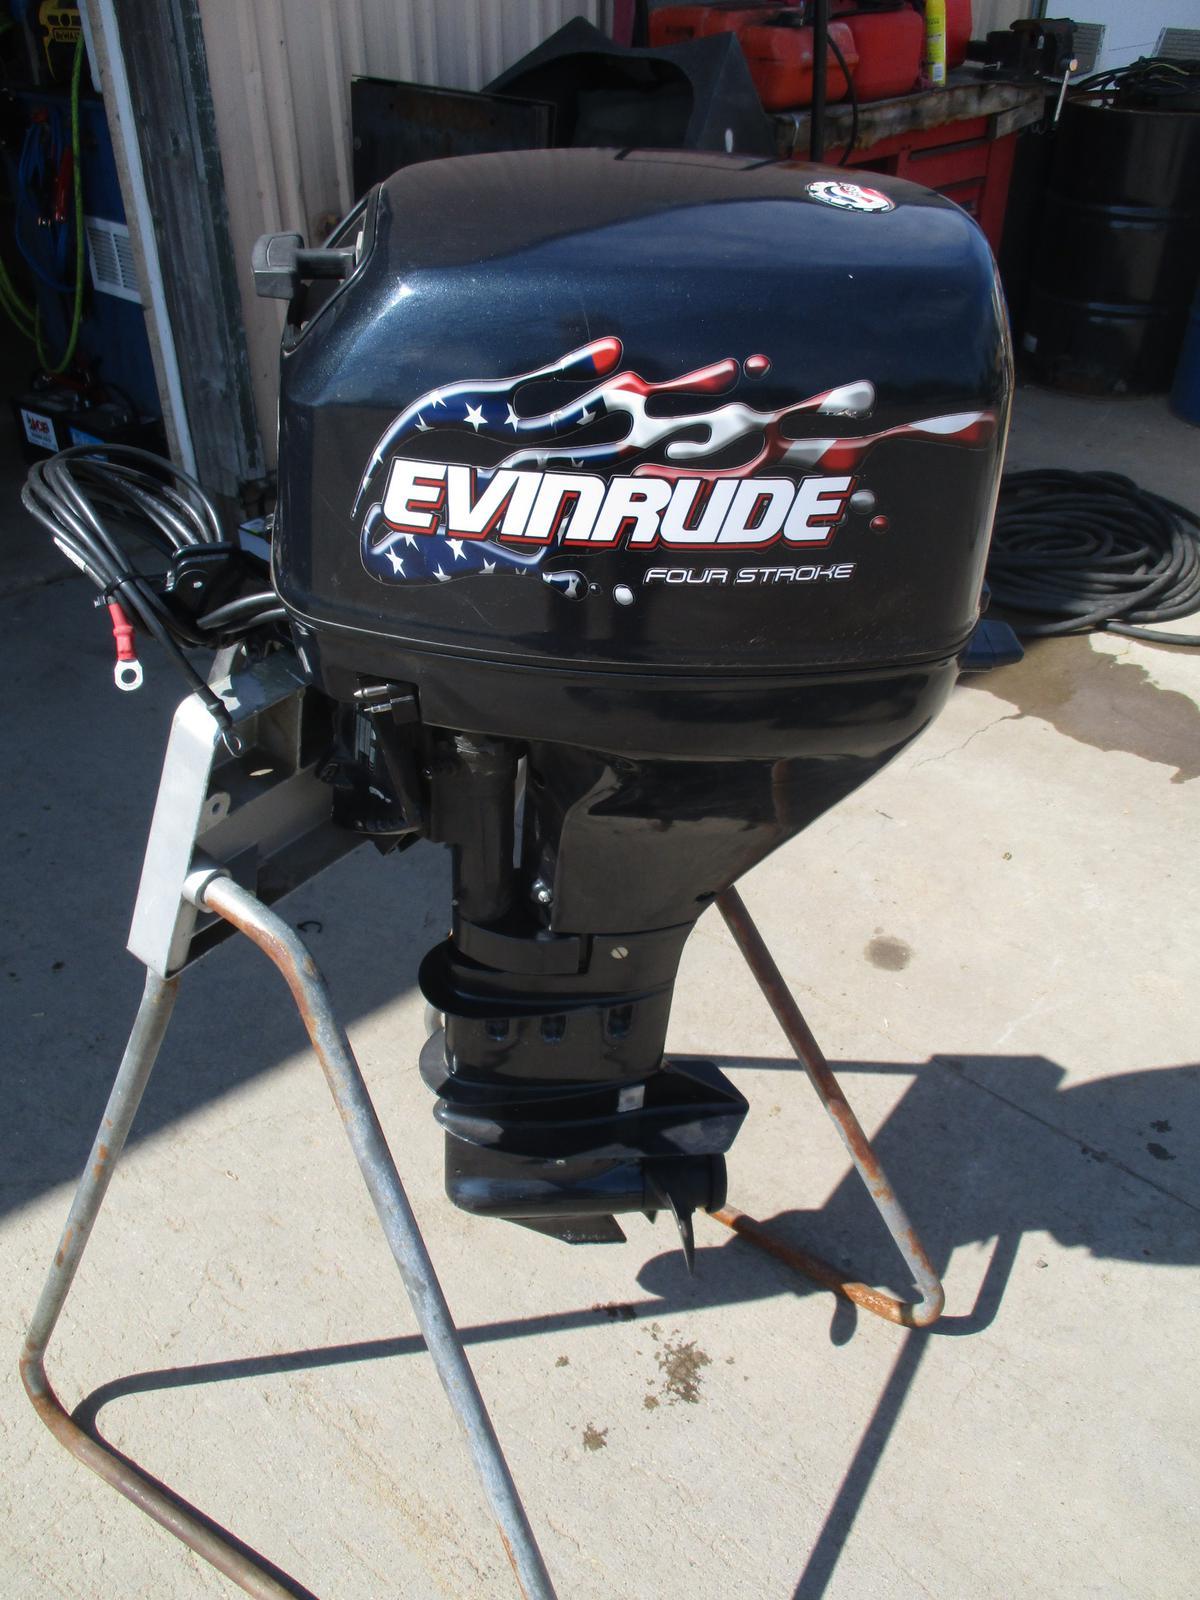 Evinrude 15 Hp >> 2000 Evinrude Evinrude 15 Hp 4 Stroke Motor For Sale In Elk River